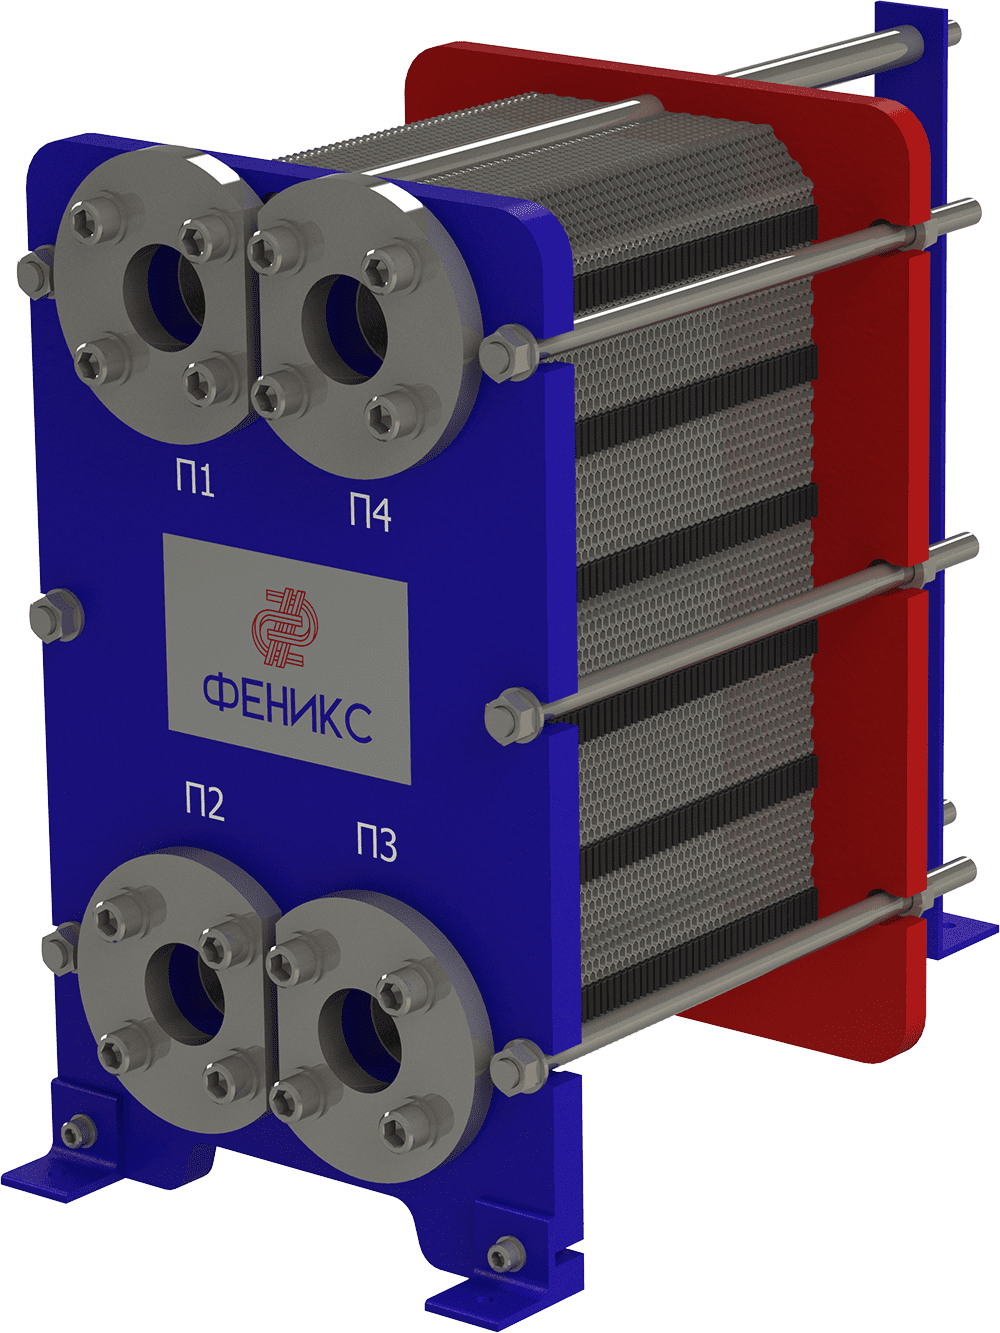 Теплообменник пластинчатый Phoenix APR 7 EPDM на 5 пластин 0,5 мм